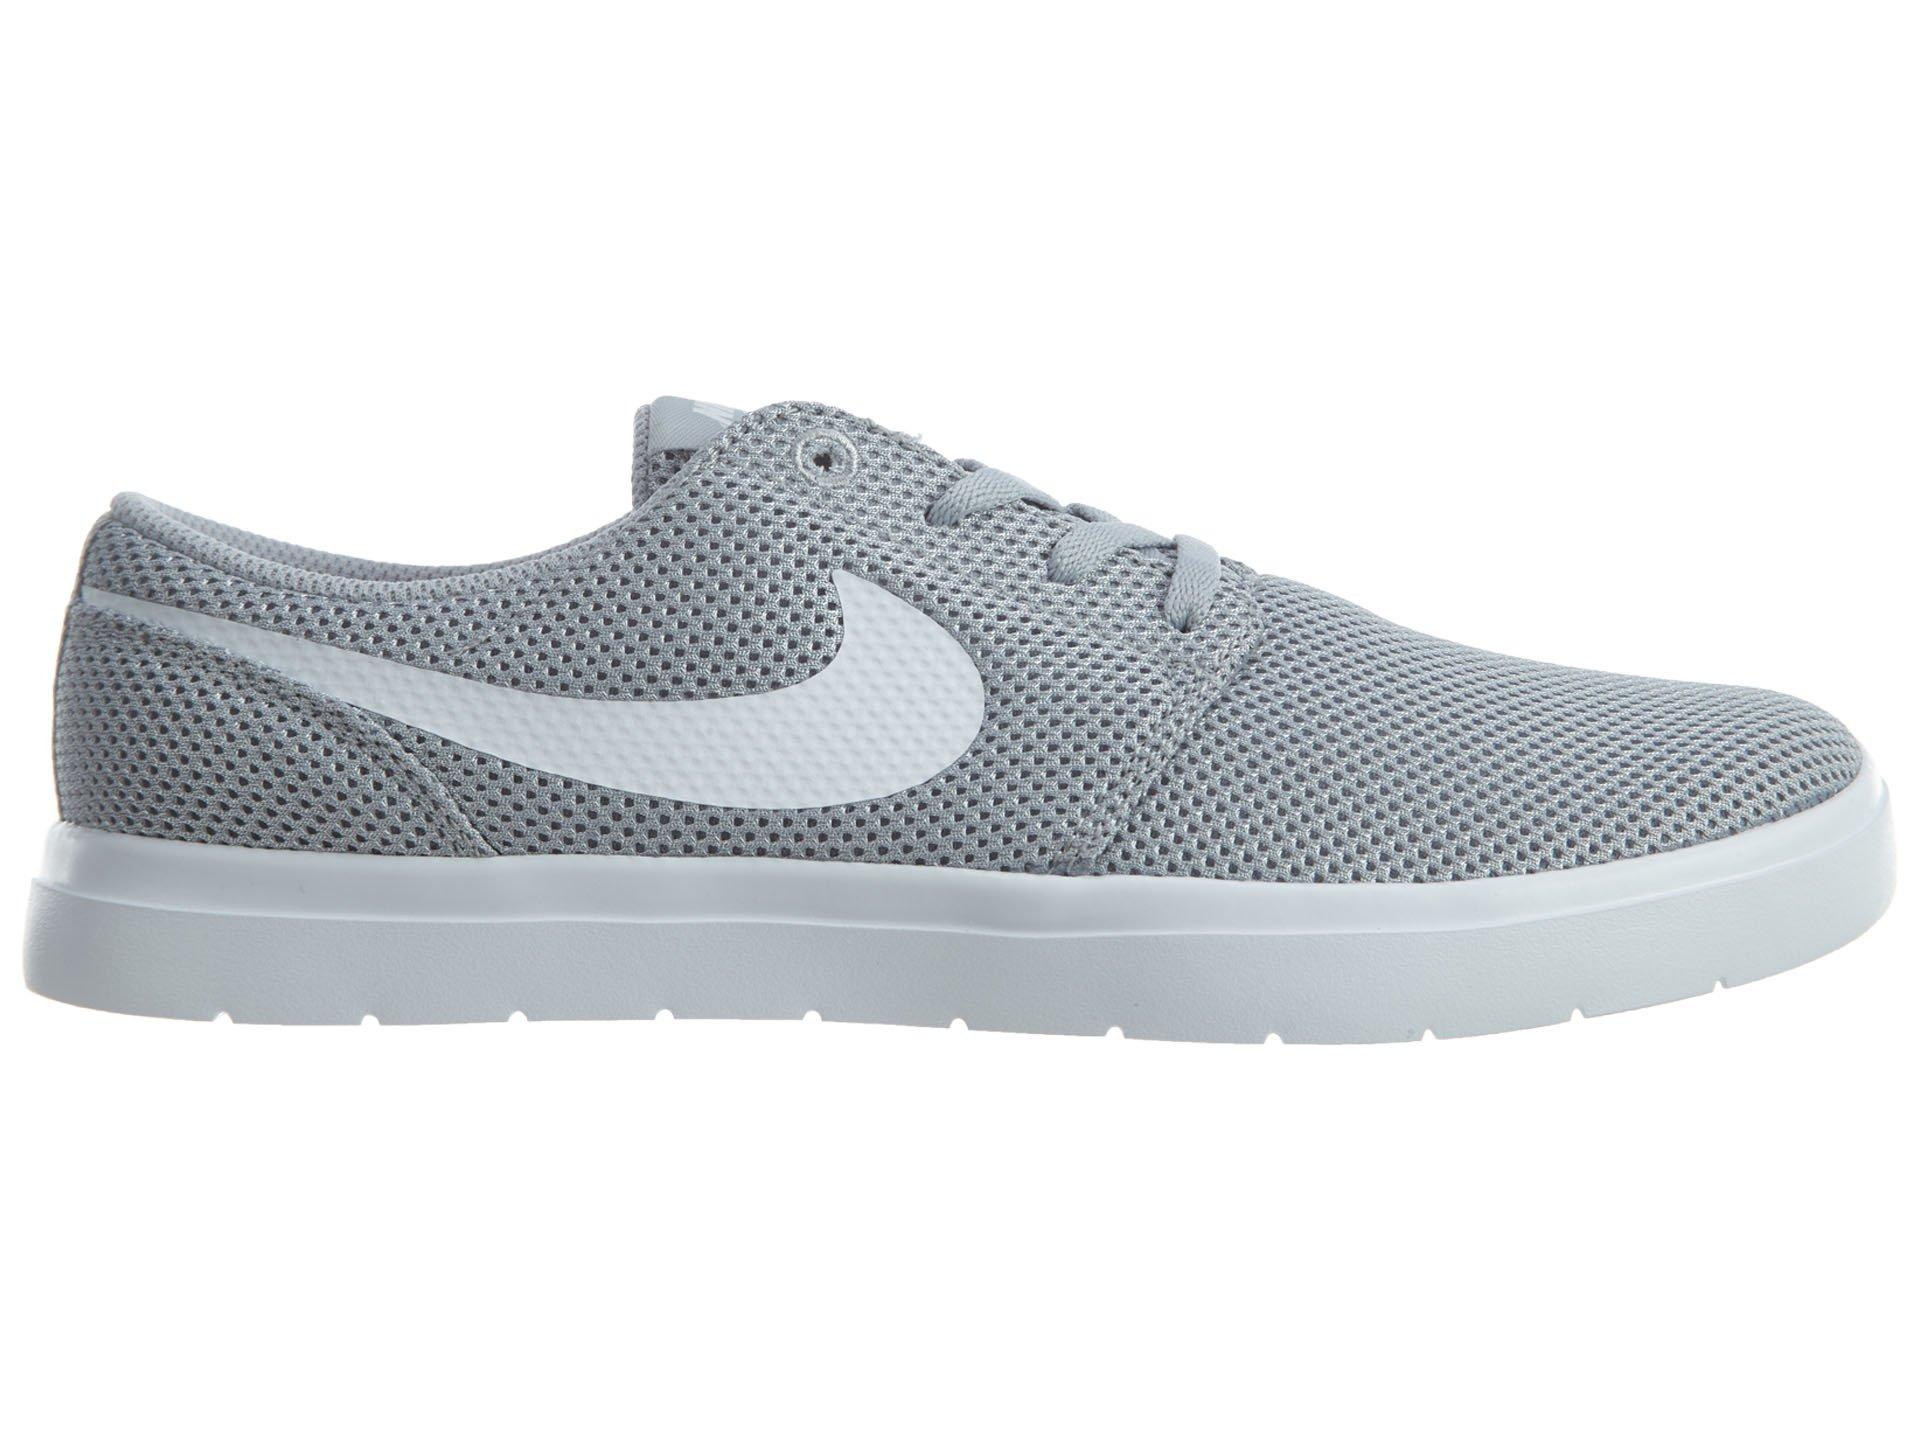 02e07e38afb054 NIKE Mens SB Portmore II Ultralight Wolf Grey White Size 10 - 880271 011    Fashion Sneakers   Clothing